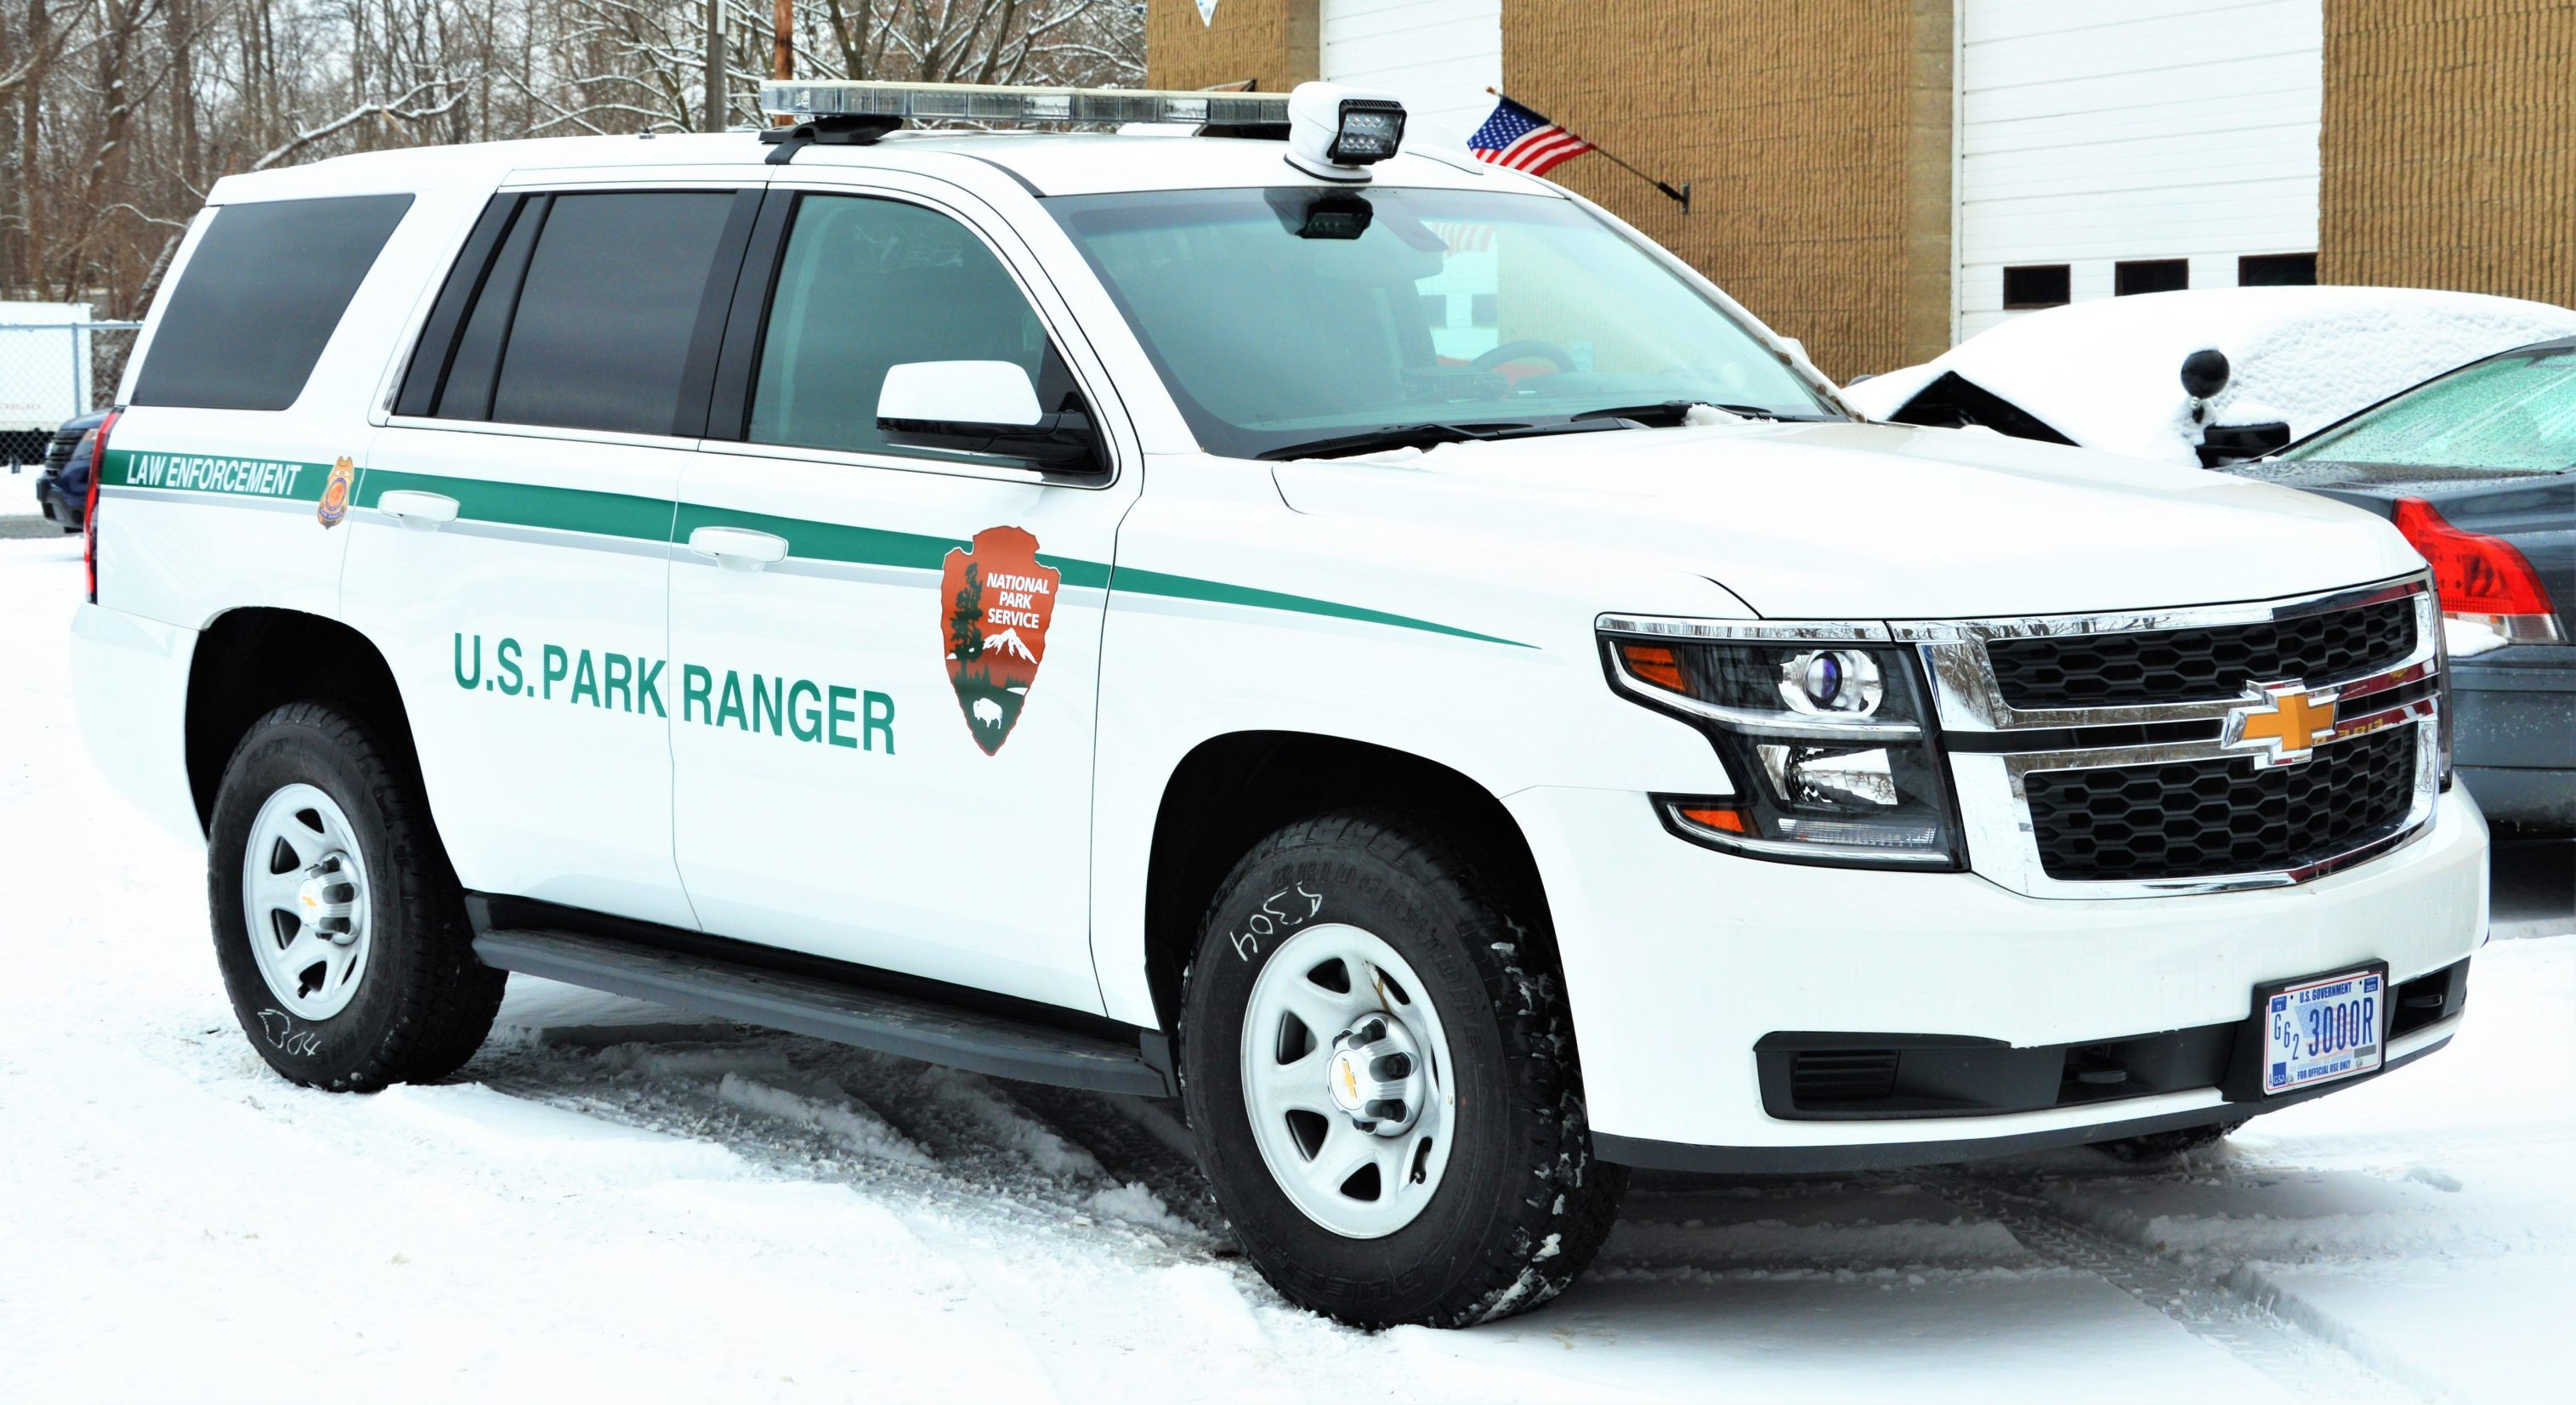 National Park Service, Saratoga NPS Chevy Tahoe vehicle